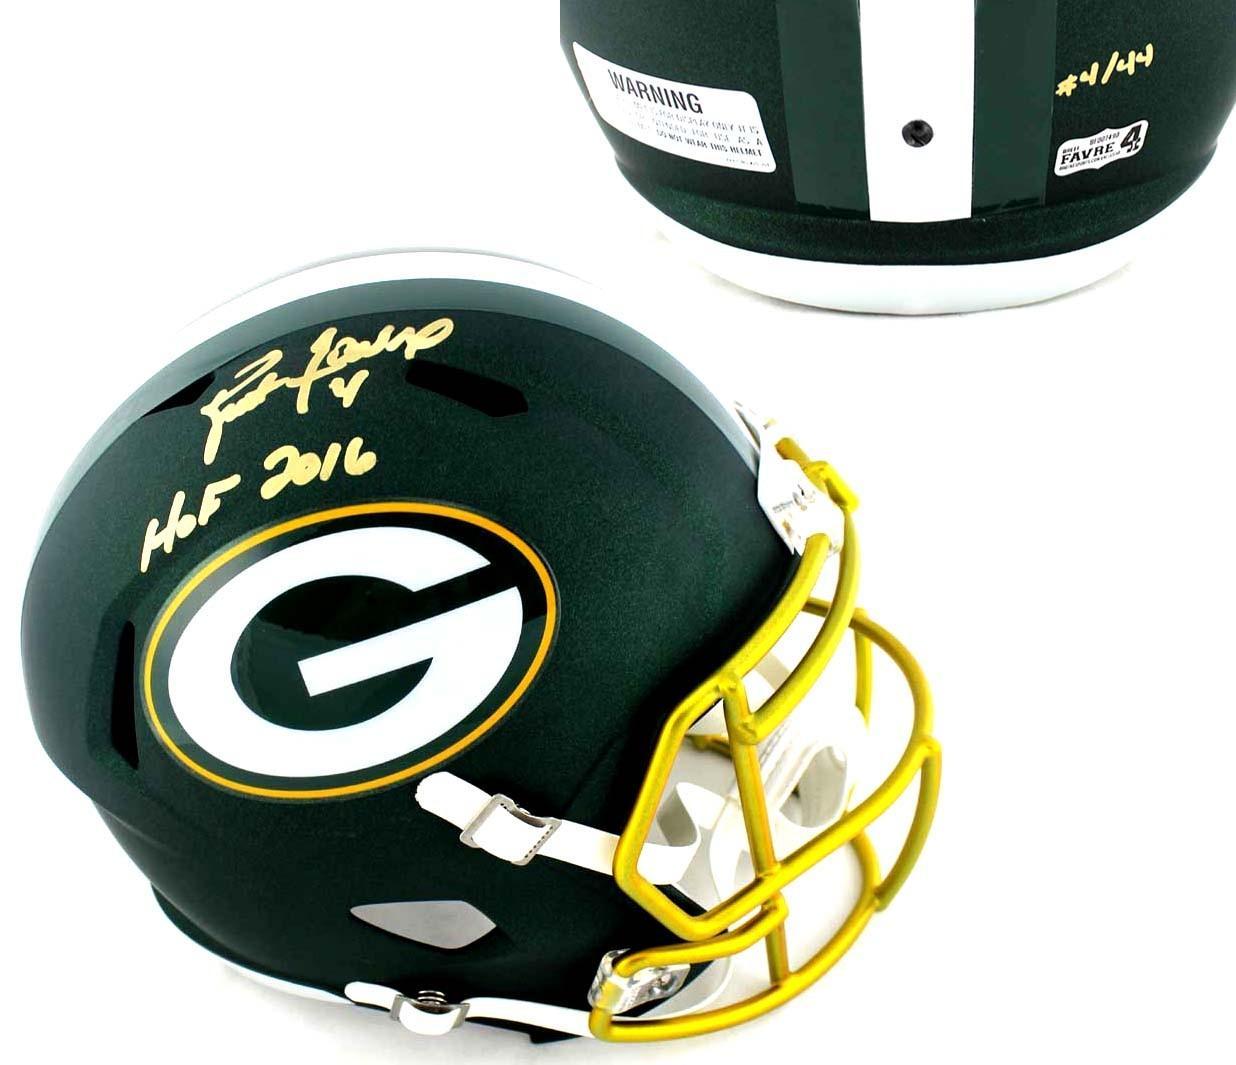 1236x1065 Autographed Nfl Helmets Signed Nfl Football Helmet, Replica